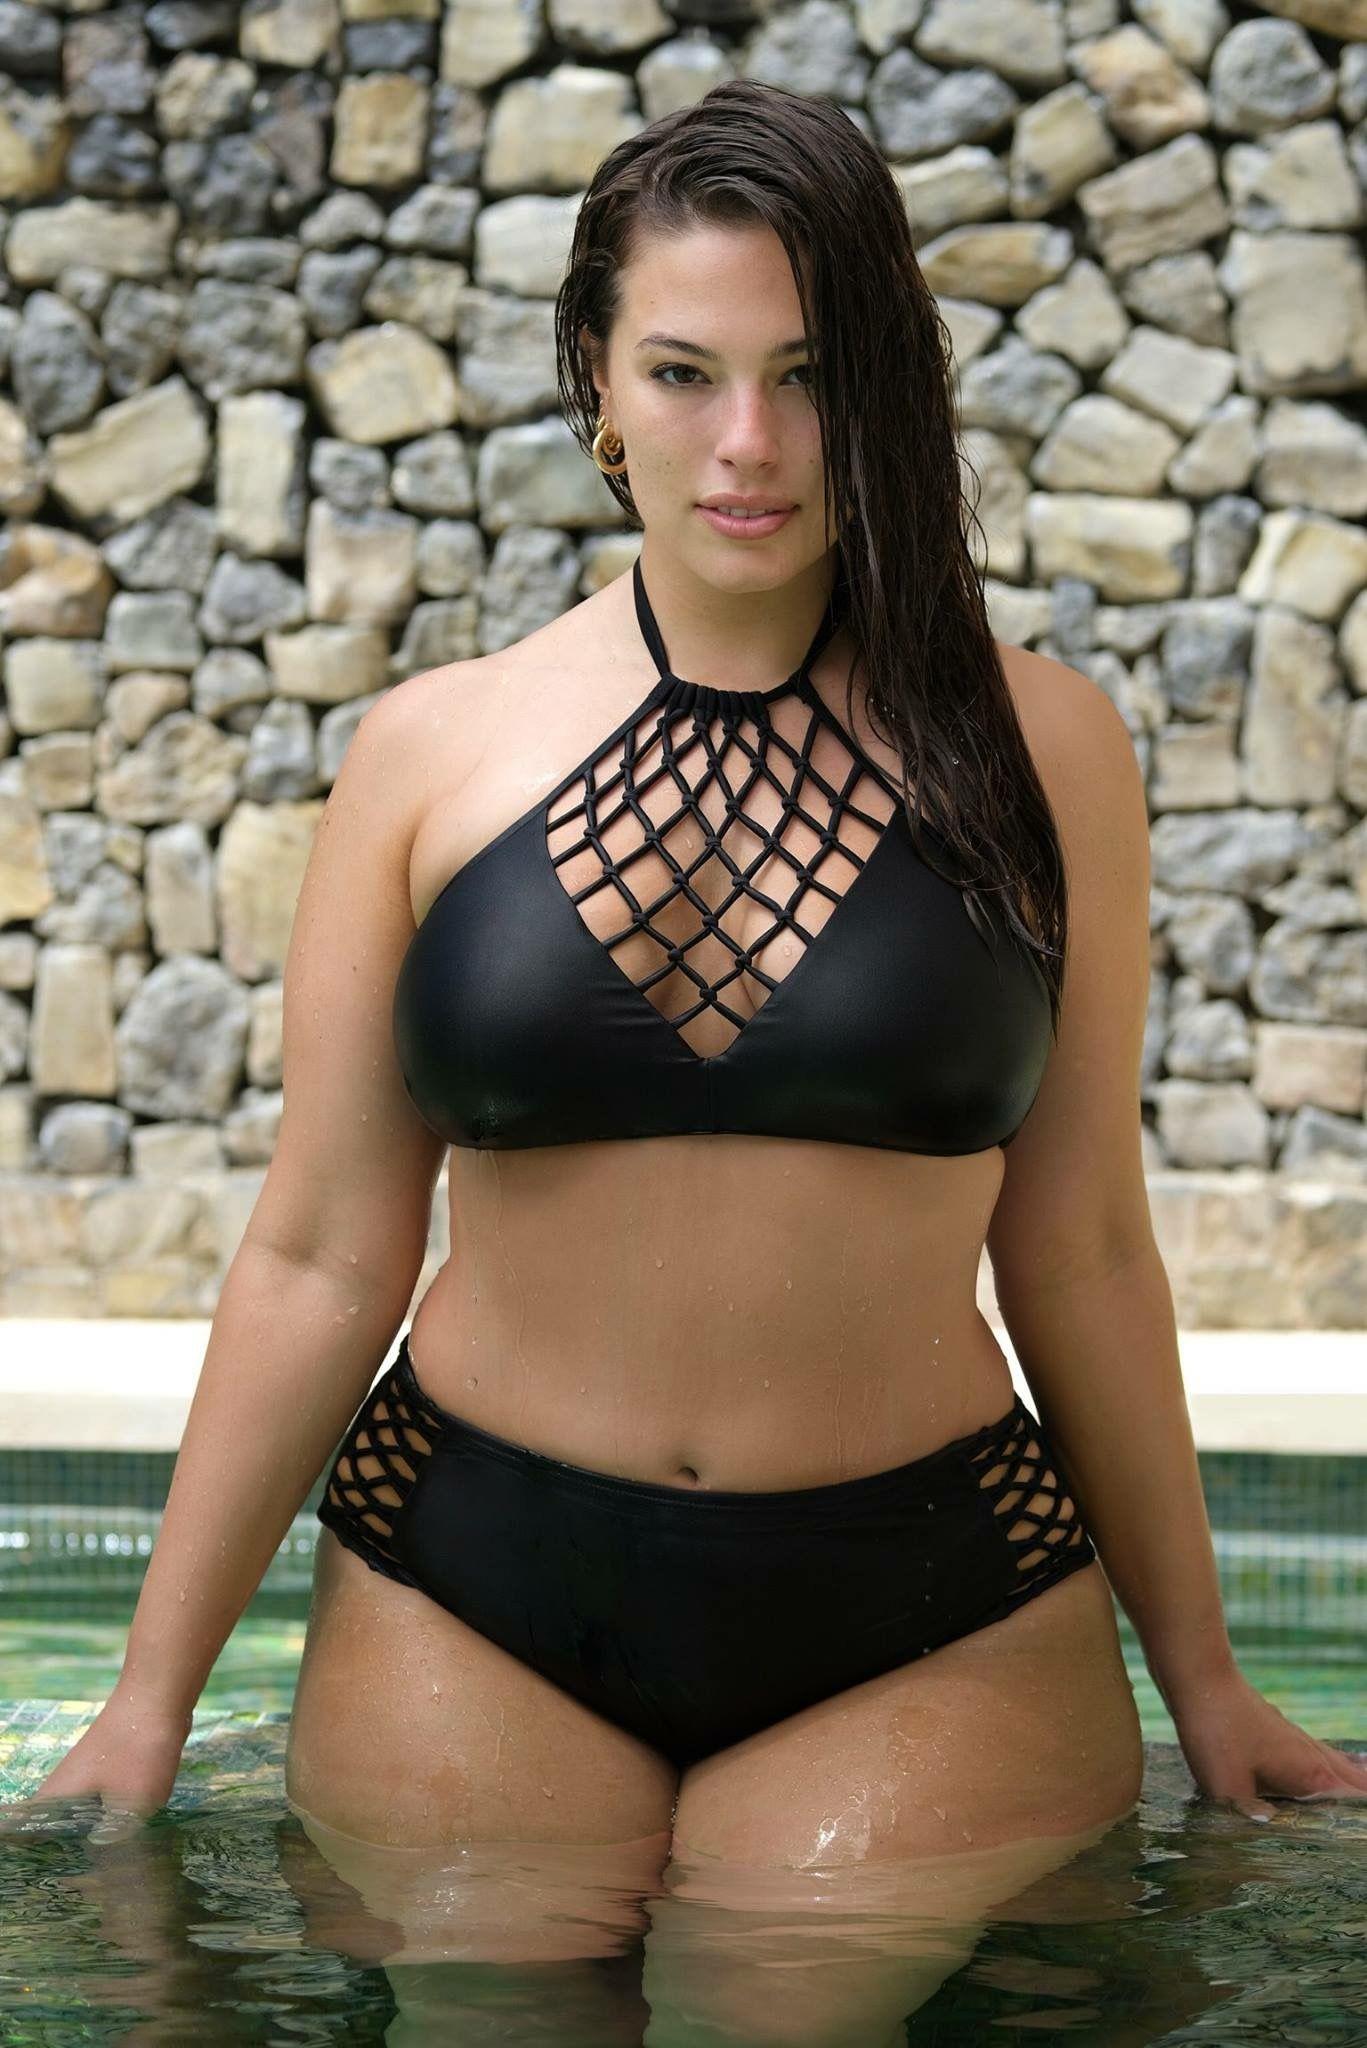 ashley graham | bbw | pinterest | graham, curves and curvy